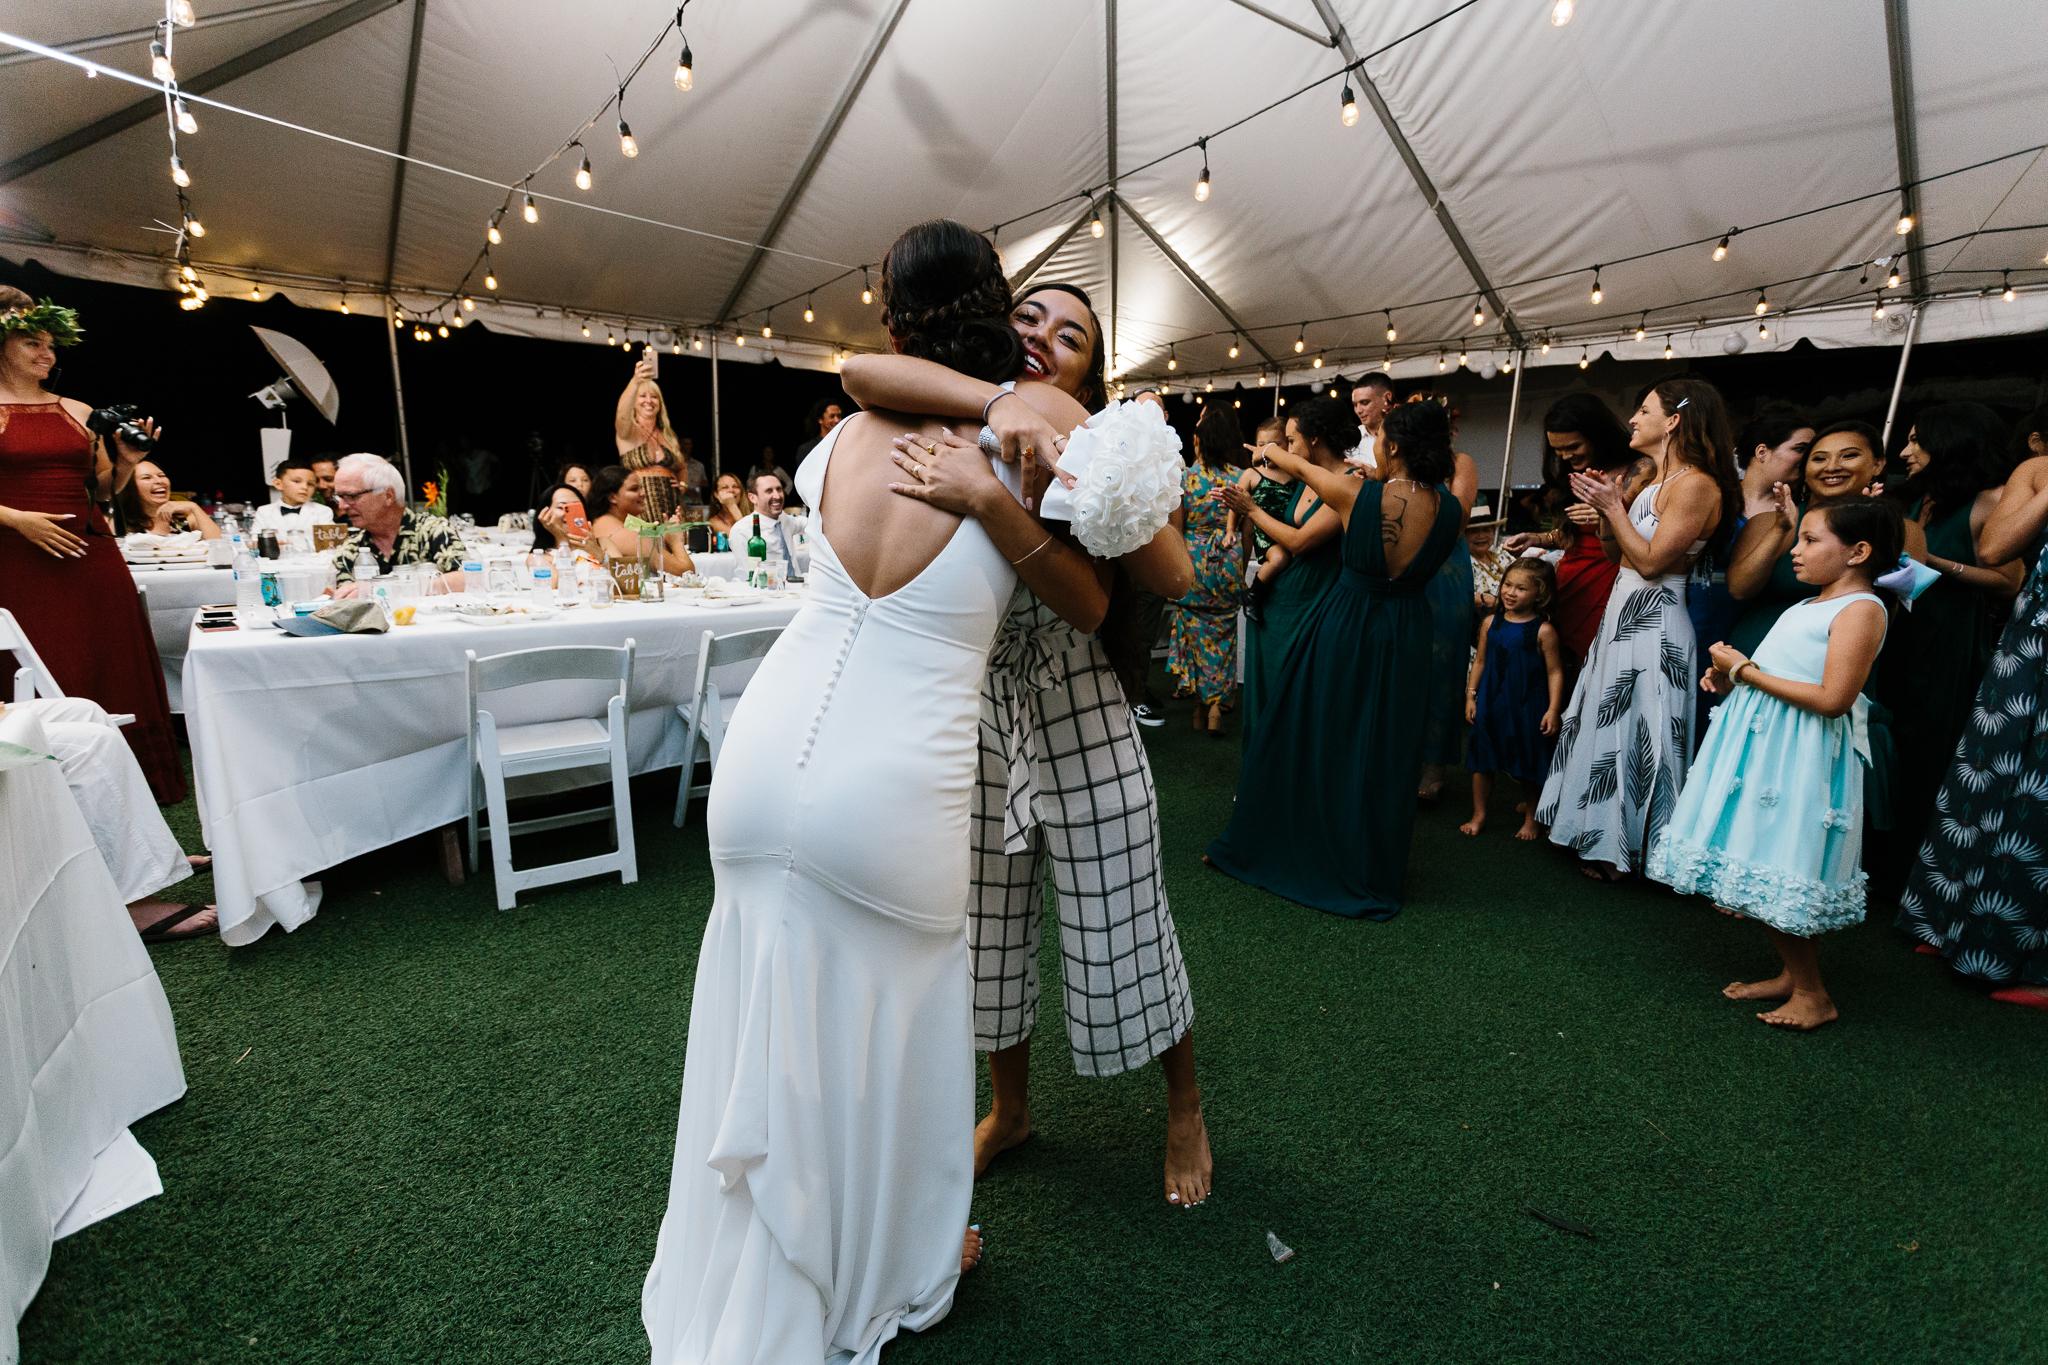 Kualoa_Ranch_Wedding_Photographer_Tone_Hawaii-54.jpg